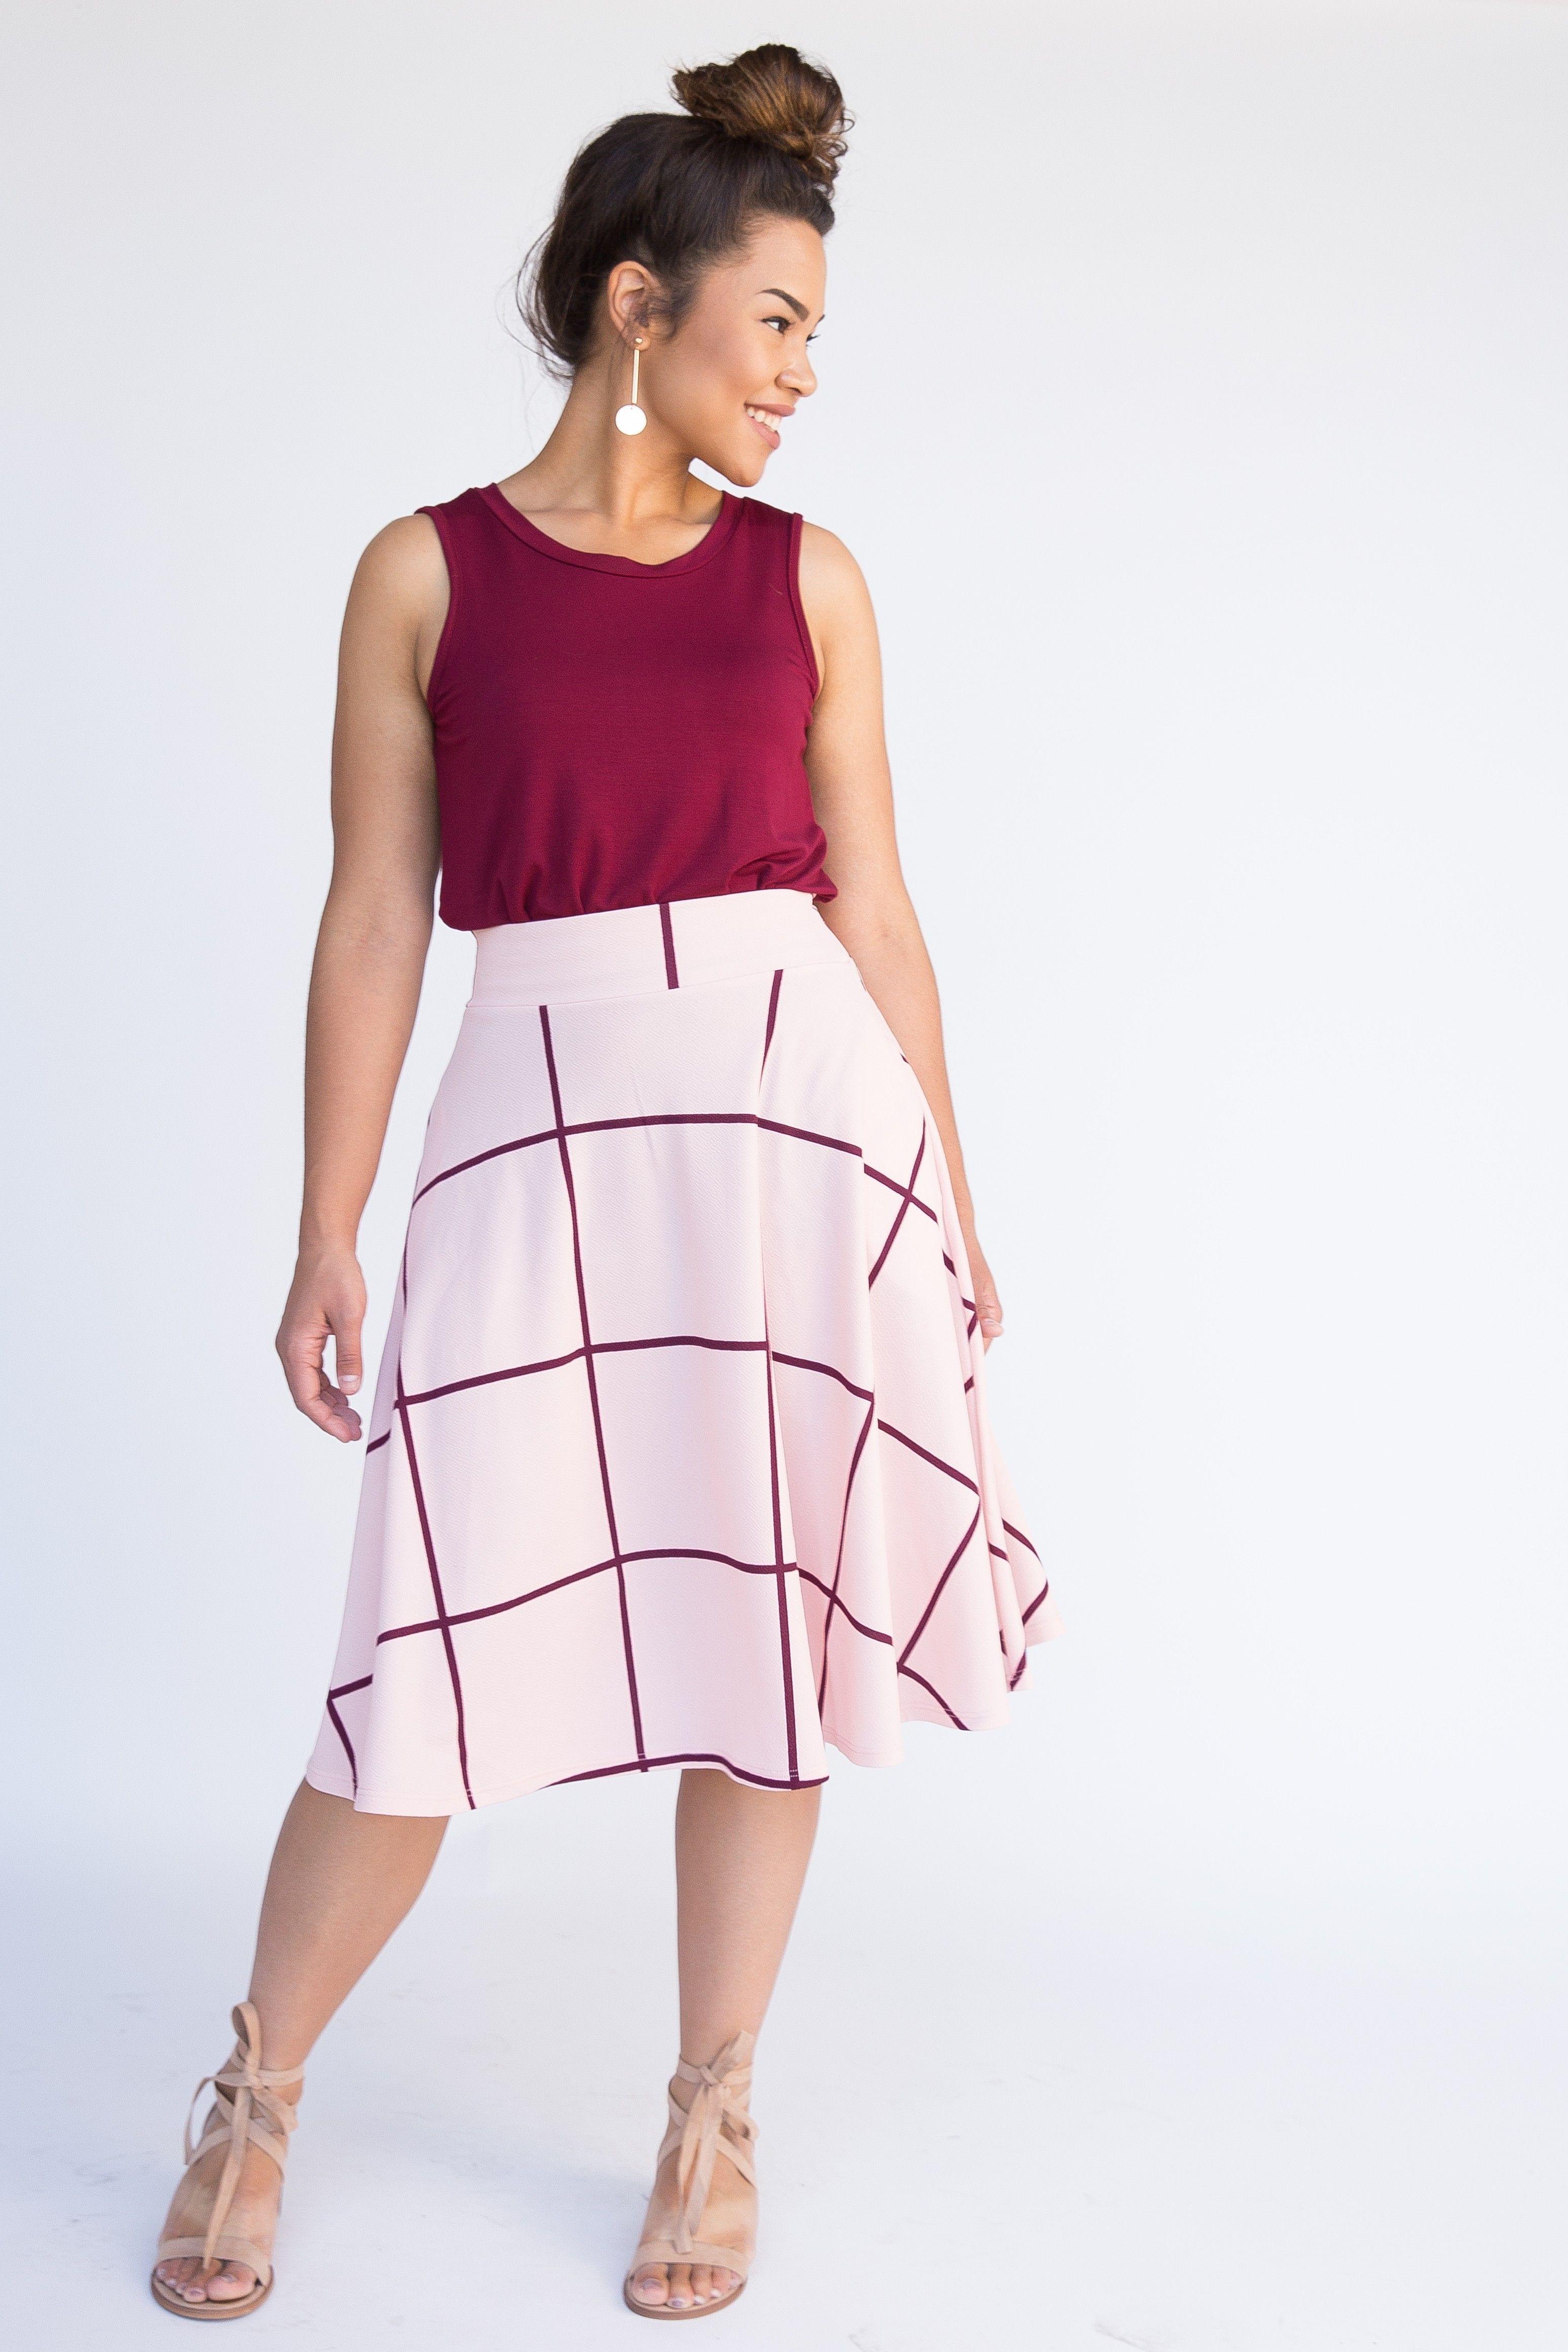 686a786215 Agnes & Dora - Midi Skirt Blush and Berry Window Pane --  WWW.BEESKITESHOP.COM --